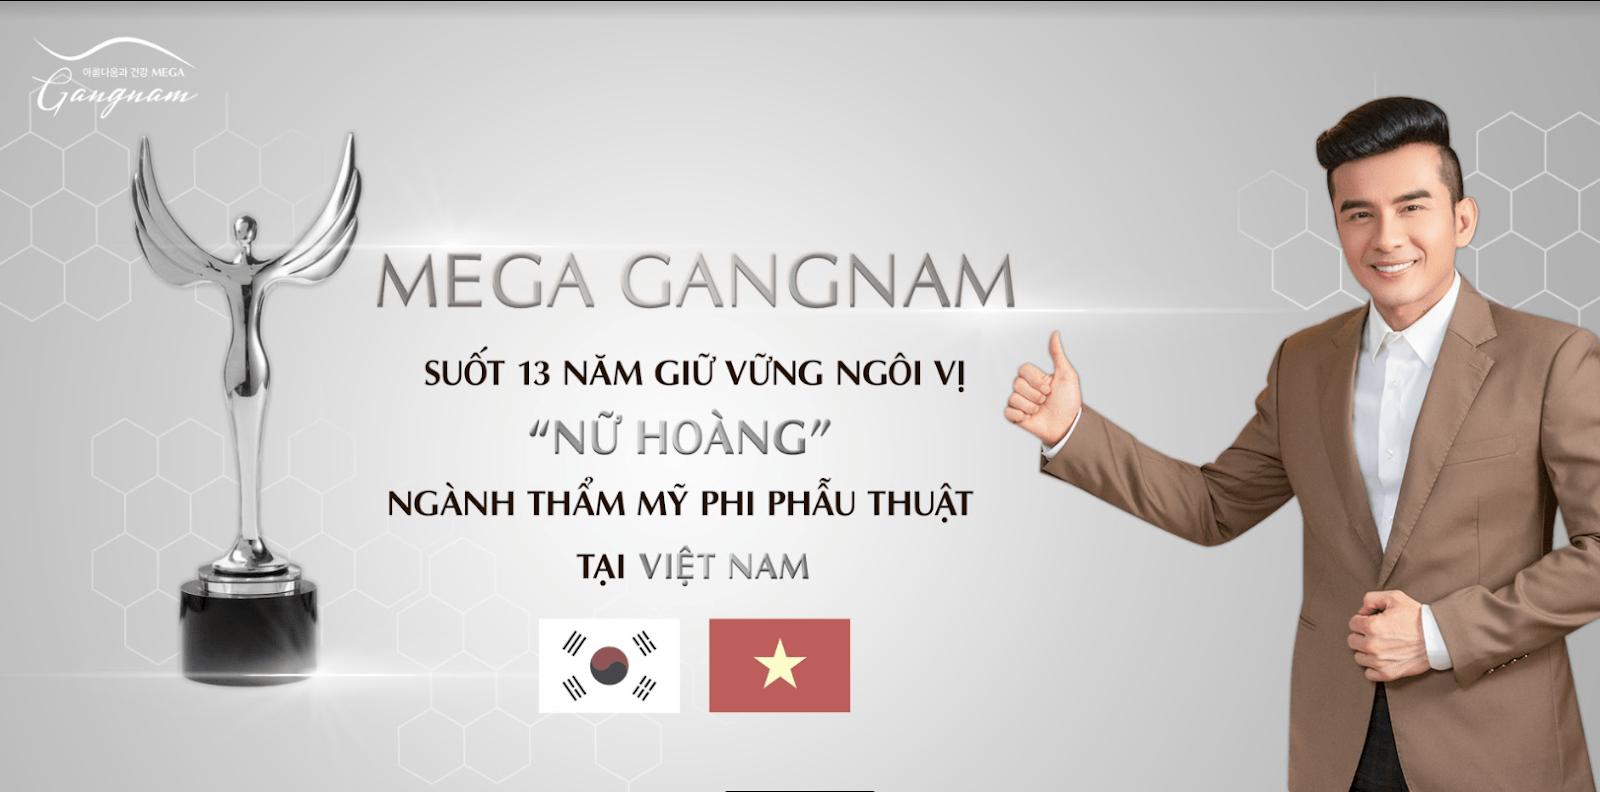 Sự thật sau tin đồn Mega Gangnam lừa đảo?